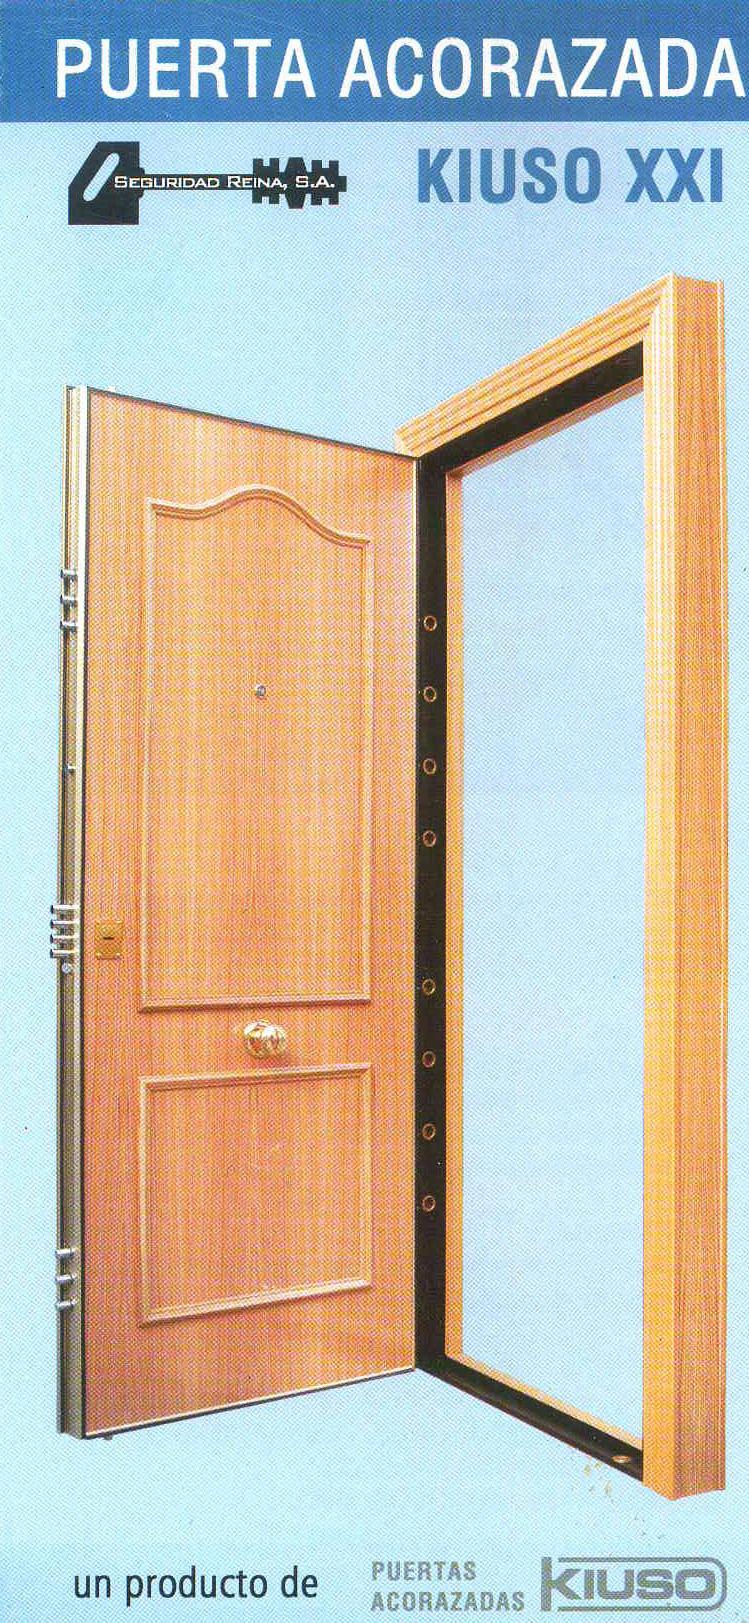 Puerta acorazada kiuso xxi sapely 20s sapely 20s instalada armarios puertas y tarimas de gercar - Puertas kiuso ...